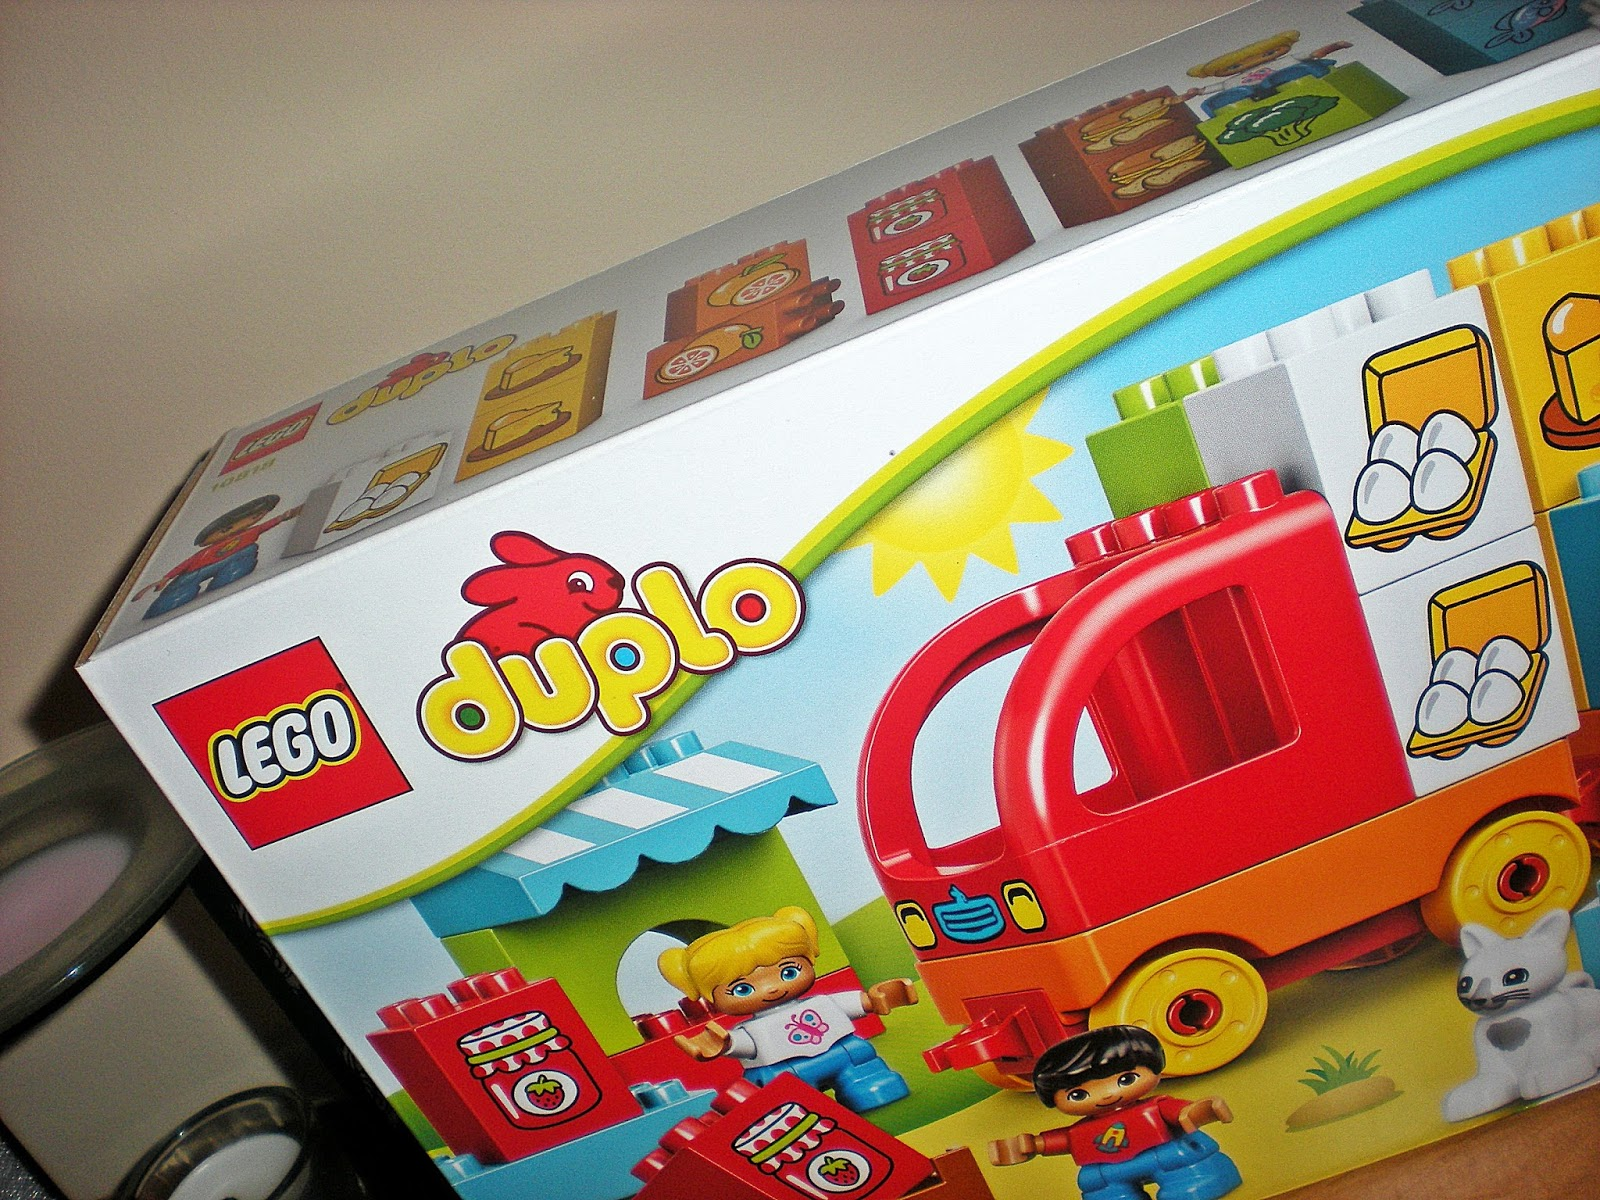 Lego Duplo Ciężarówka od TestMeToo